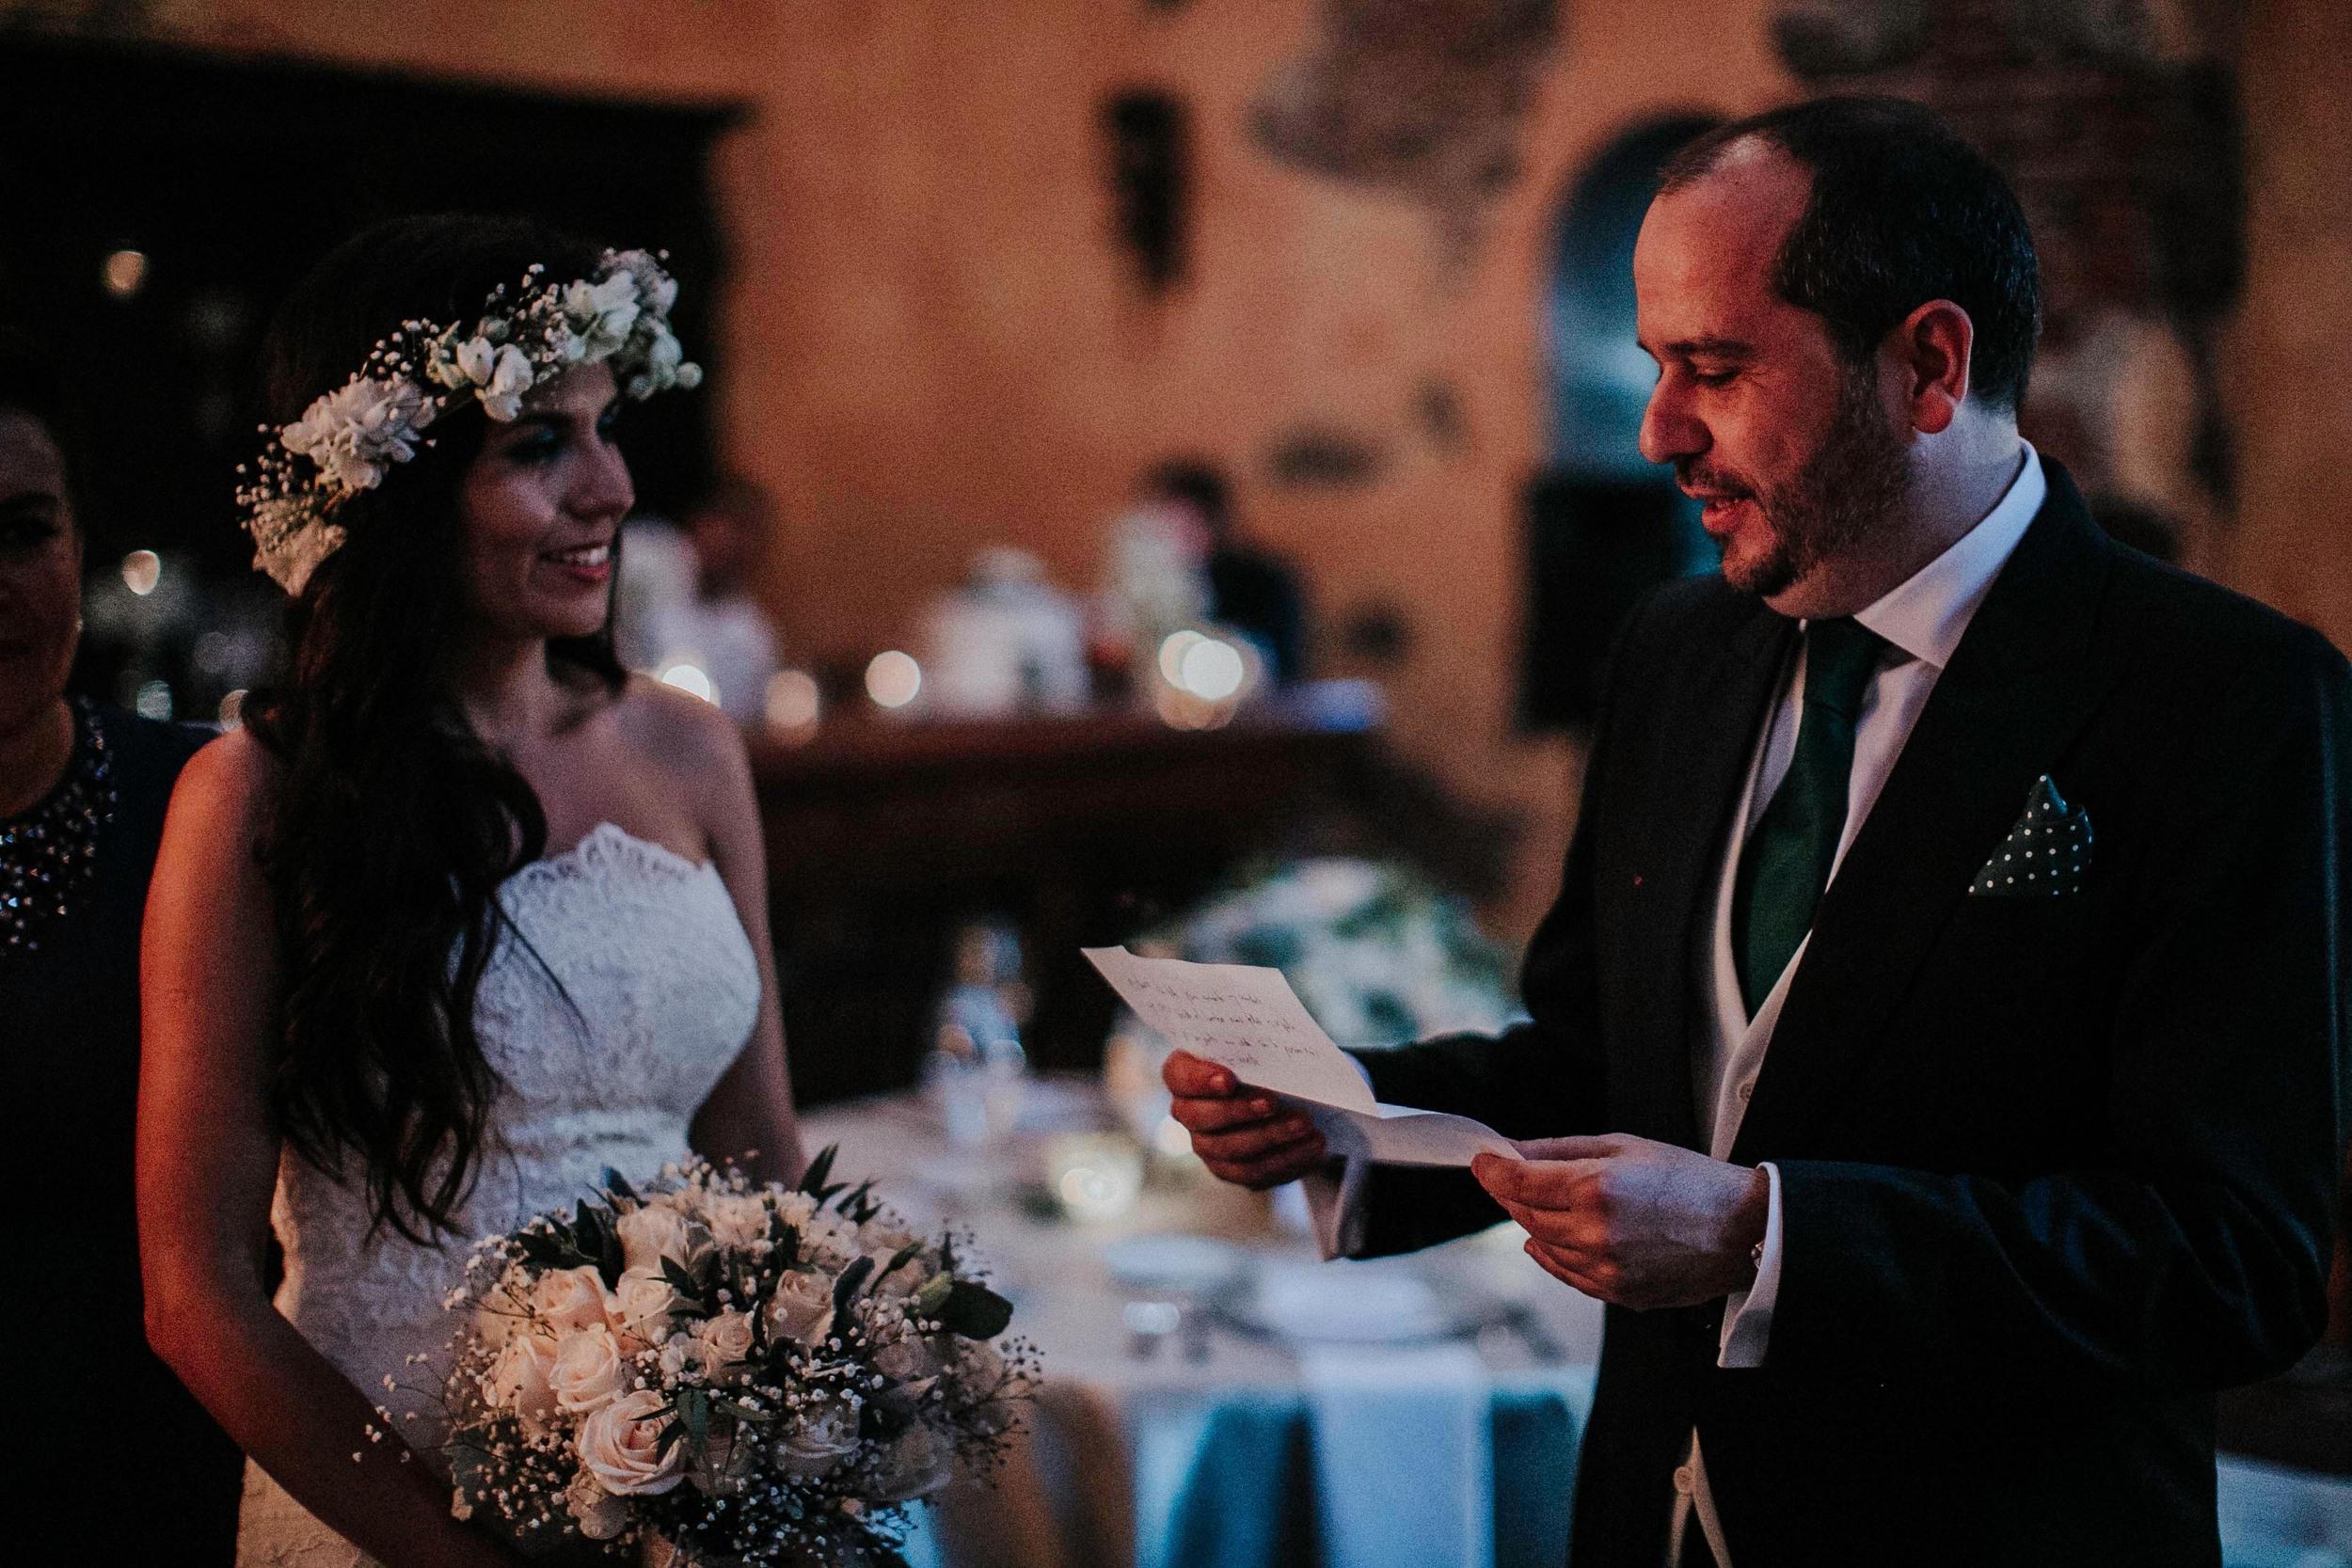 DJ8A9009-Editaralfonso_flores_destination_wedding_photographer_San_gabriel_de_las_palmas.jpg